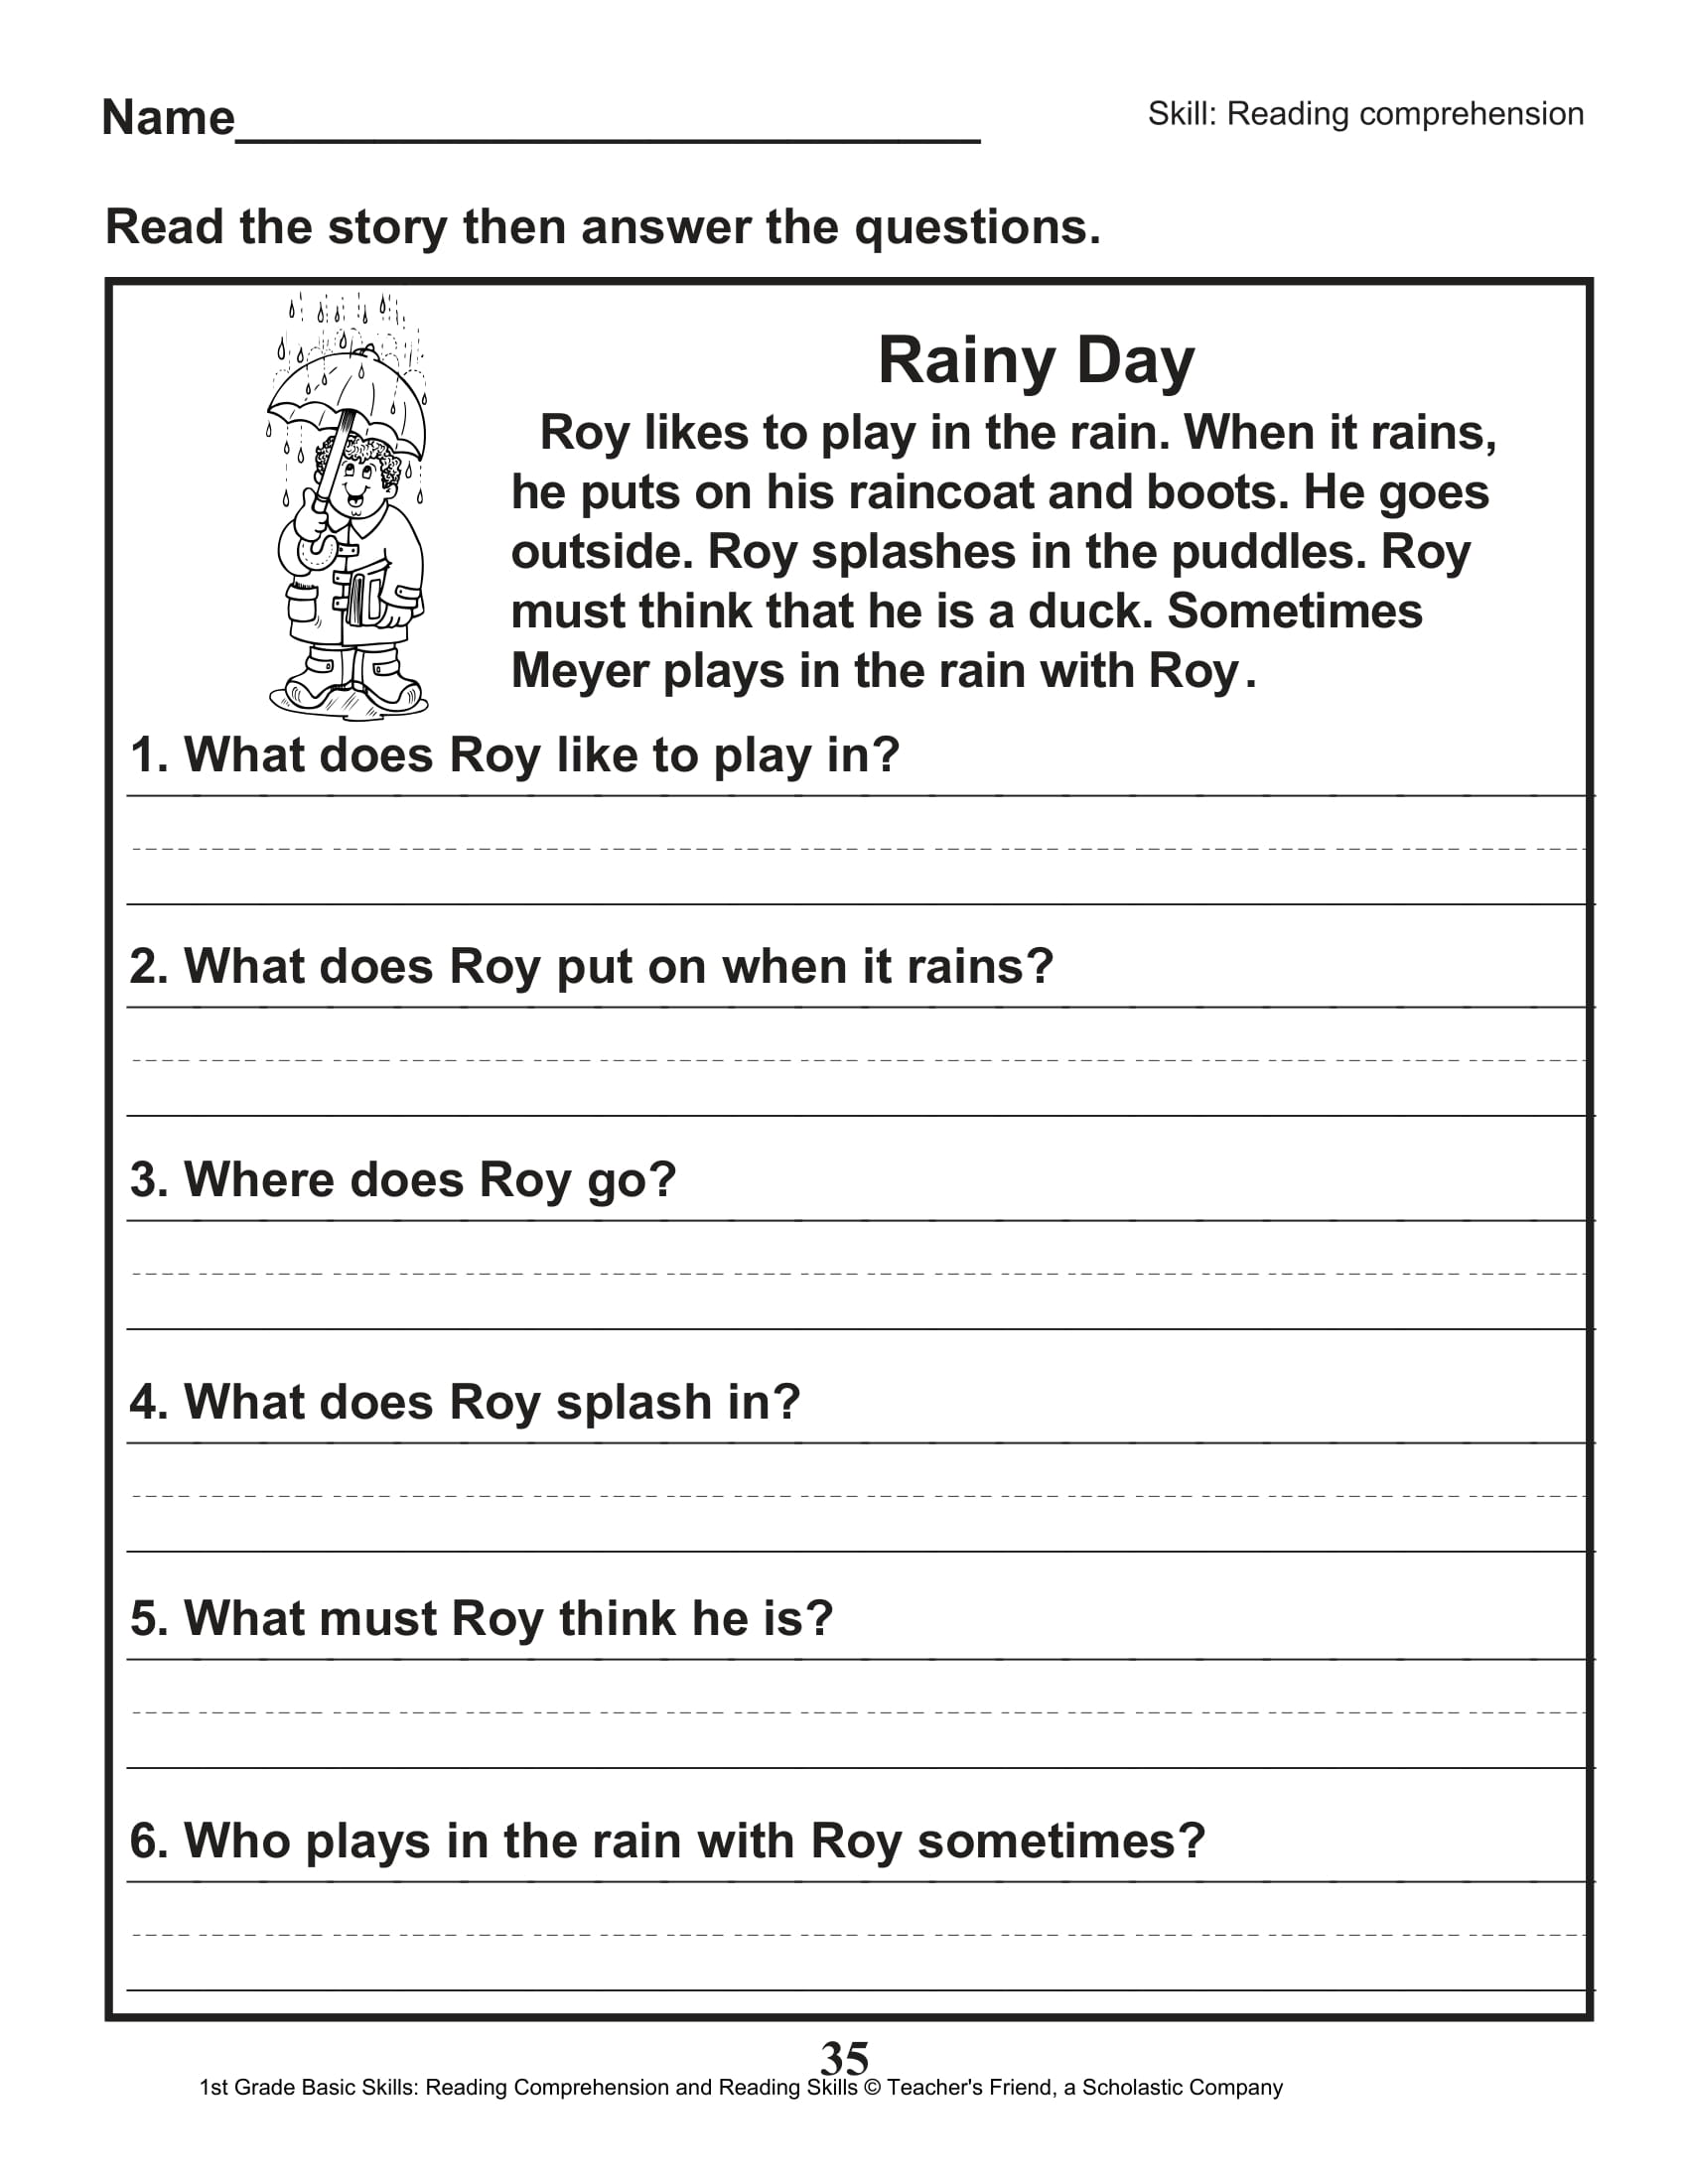 Scholastic 1st Grade Reading Comprehension Skills Worksheets 36